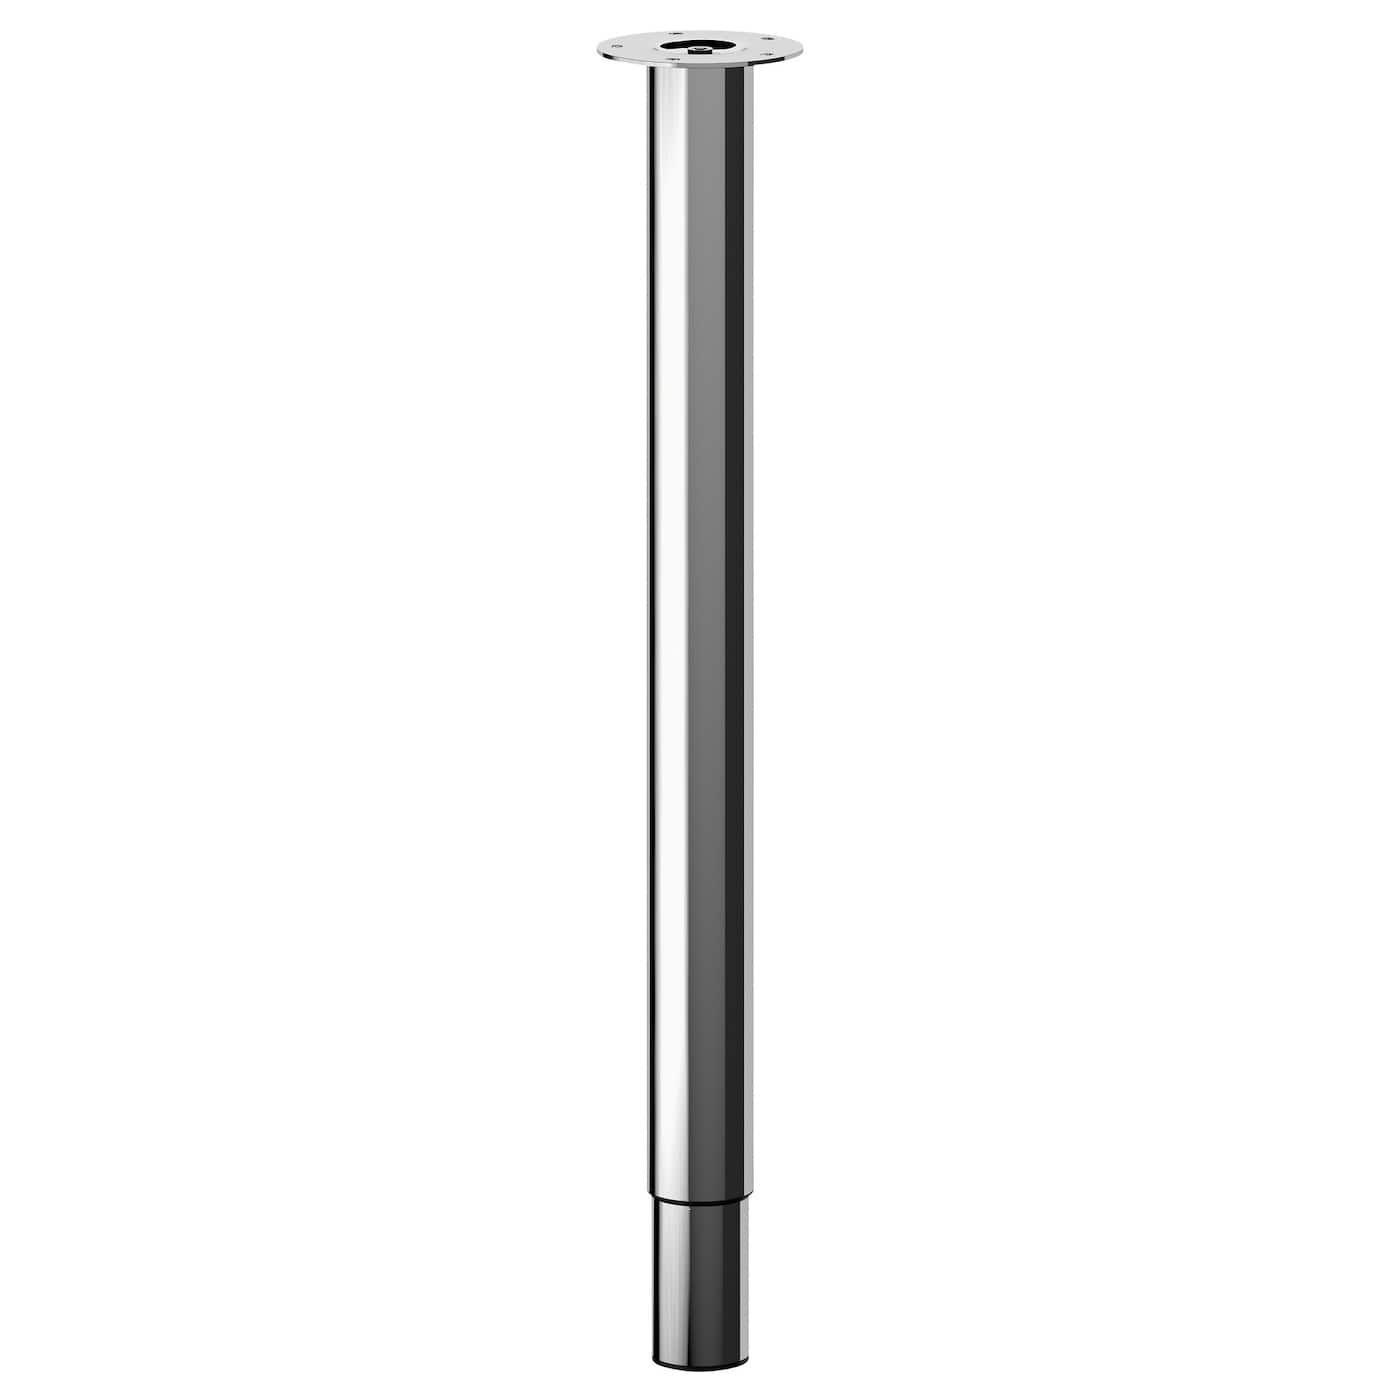 Gambe Per Mobili Ikea gerton gamba regolabile - cromato | ikea, gambe e arredamento